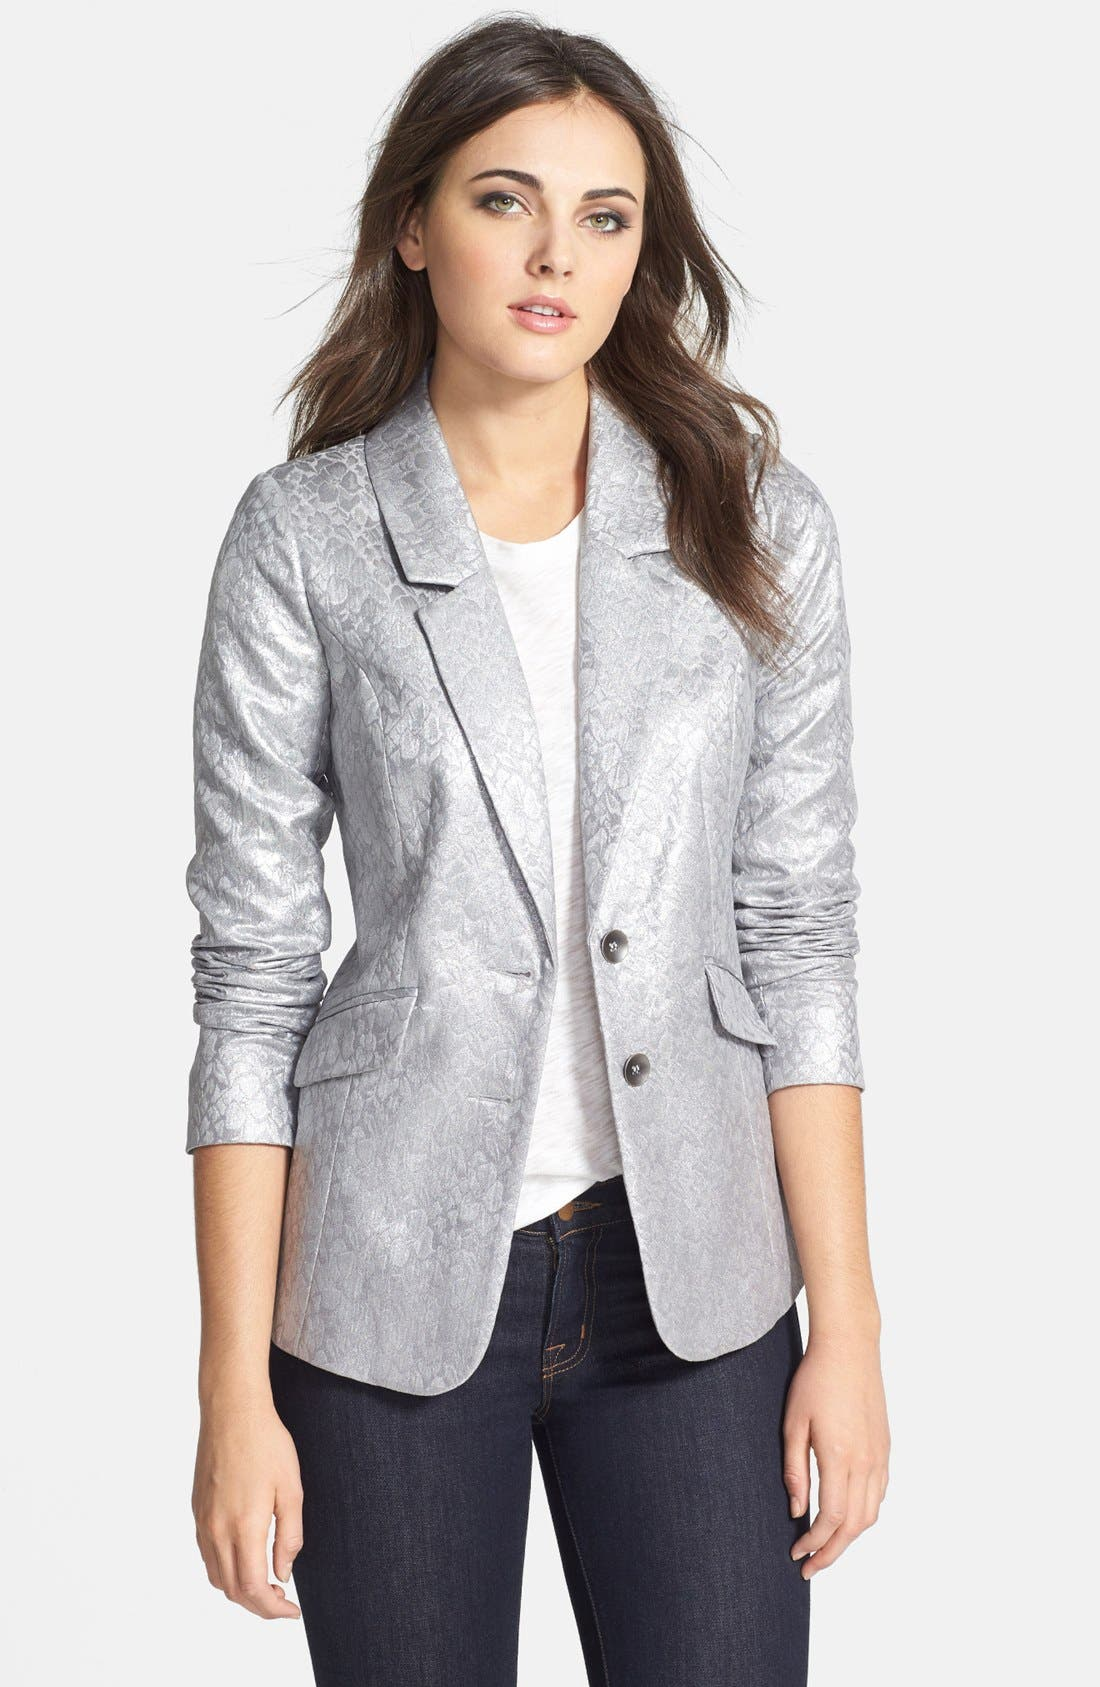 Alternate Image 1 Selected - kensie Foil Brocade Jacquard Jacket